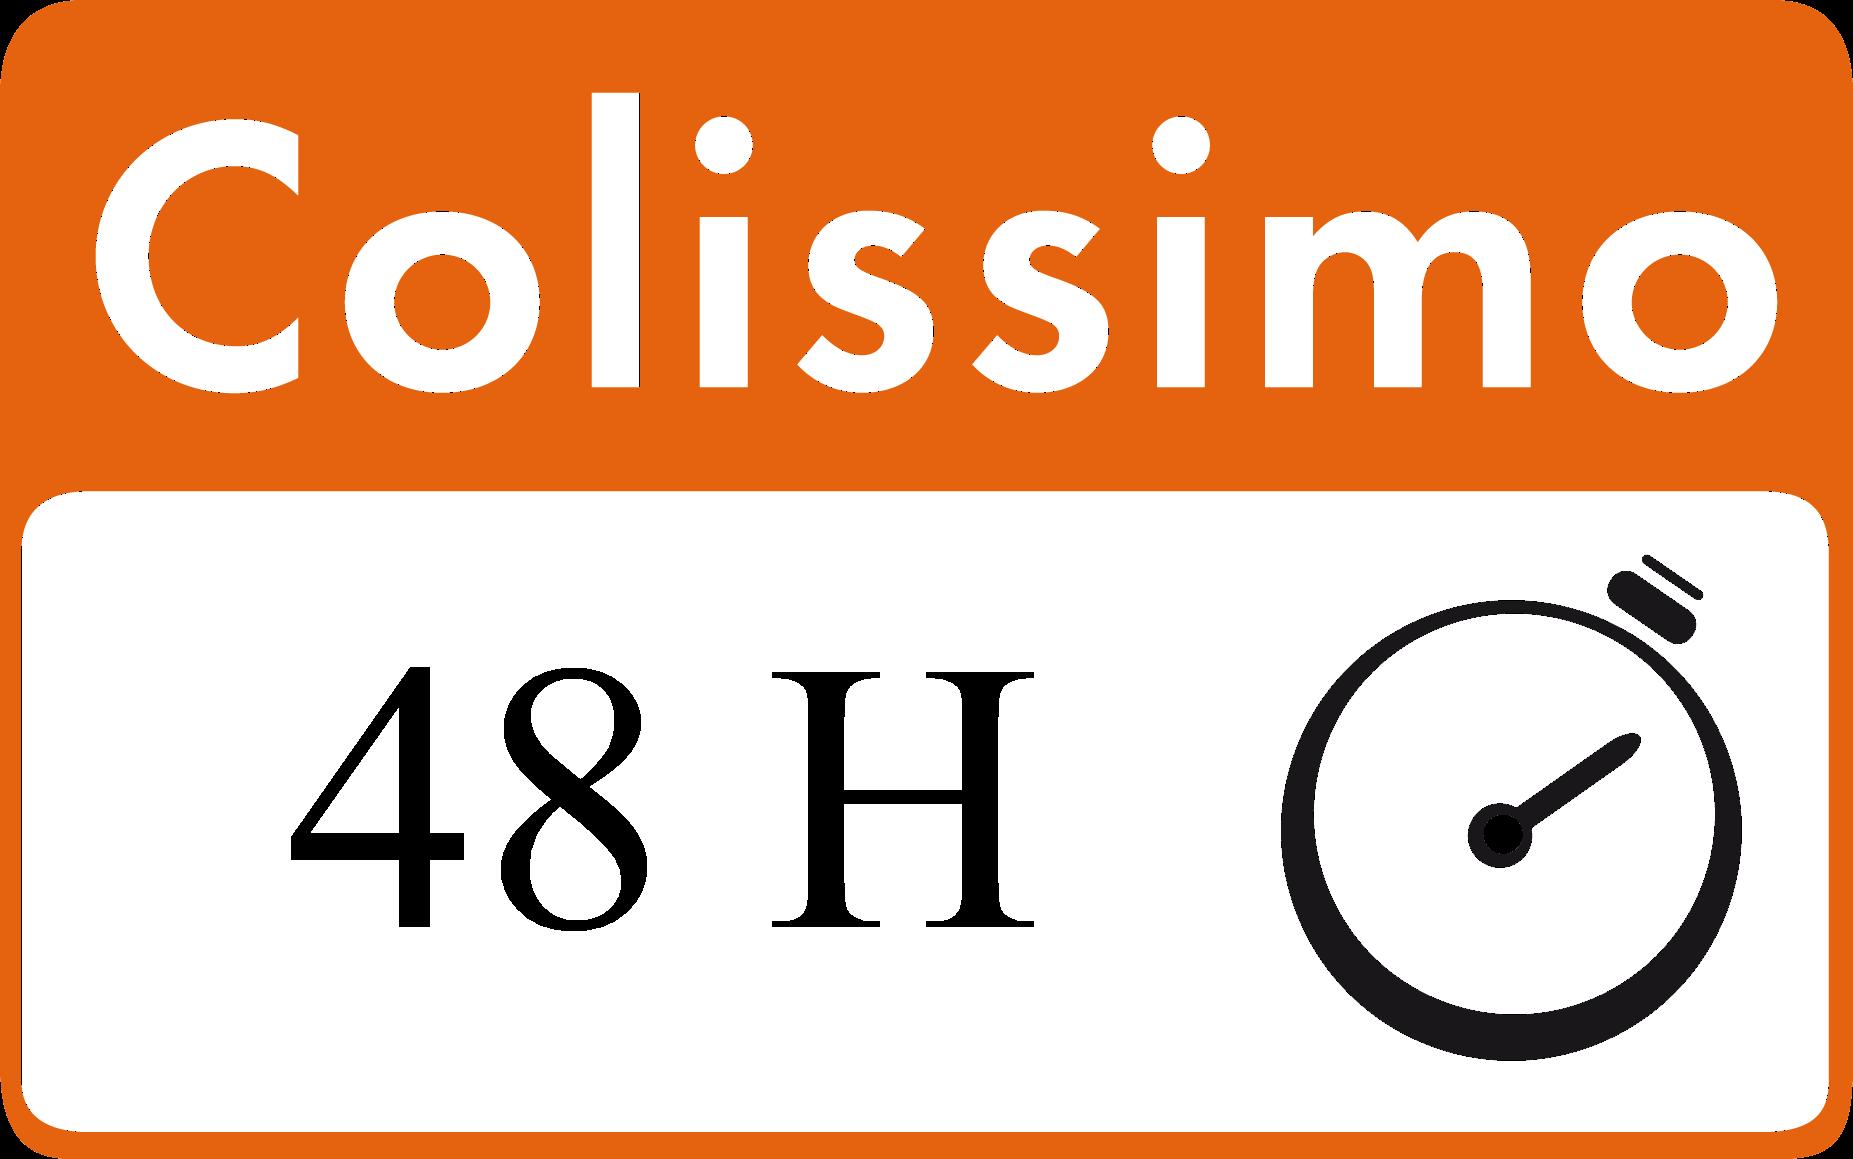 Livraisoncolissimo48h